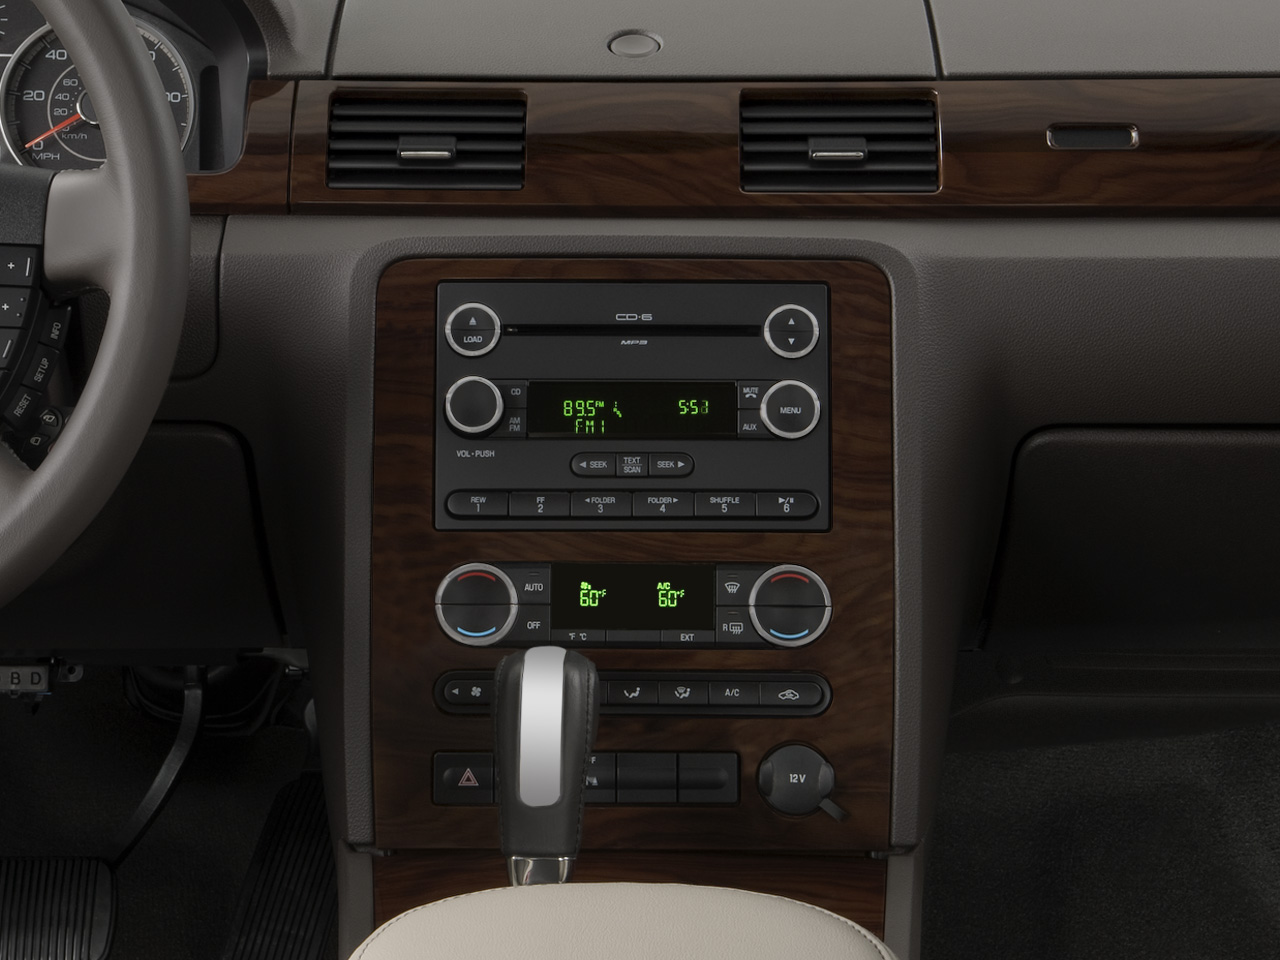 https://st.automobilemag.com/uploads/sites/10/2015/11/2008-ford-taurus-sel-sedan-instrument-panel.png